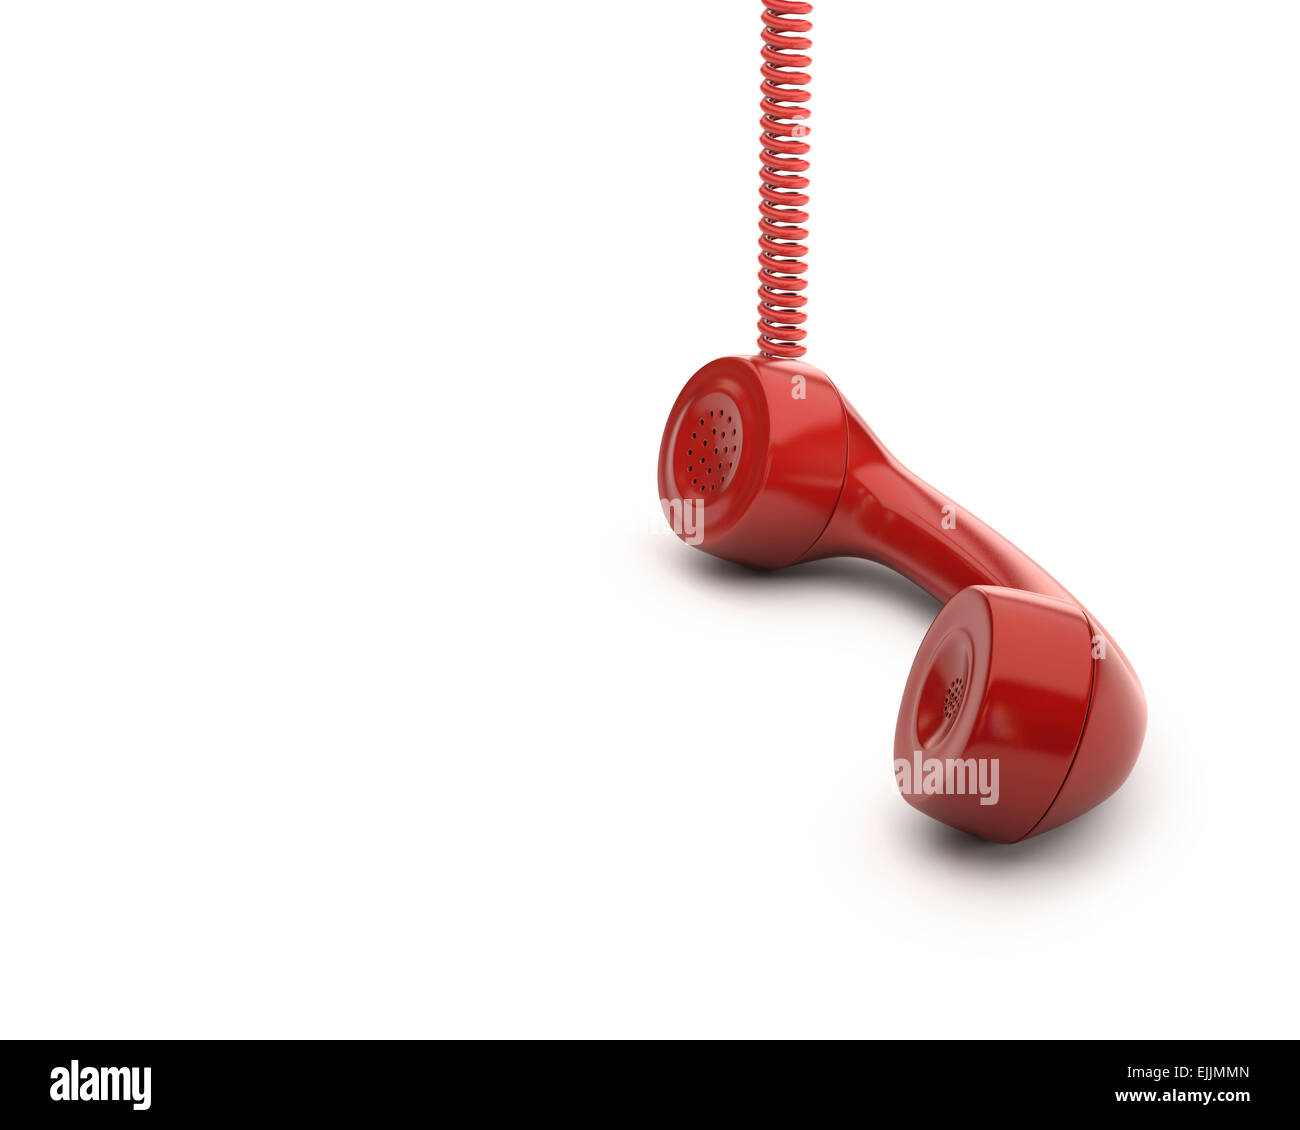 Red telephone handset, computer illustration. - Stock Image